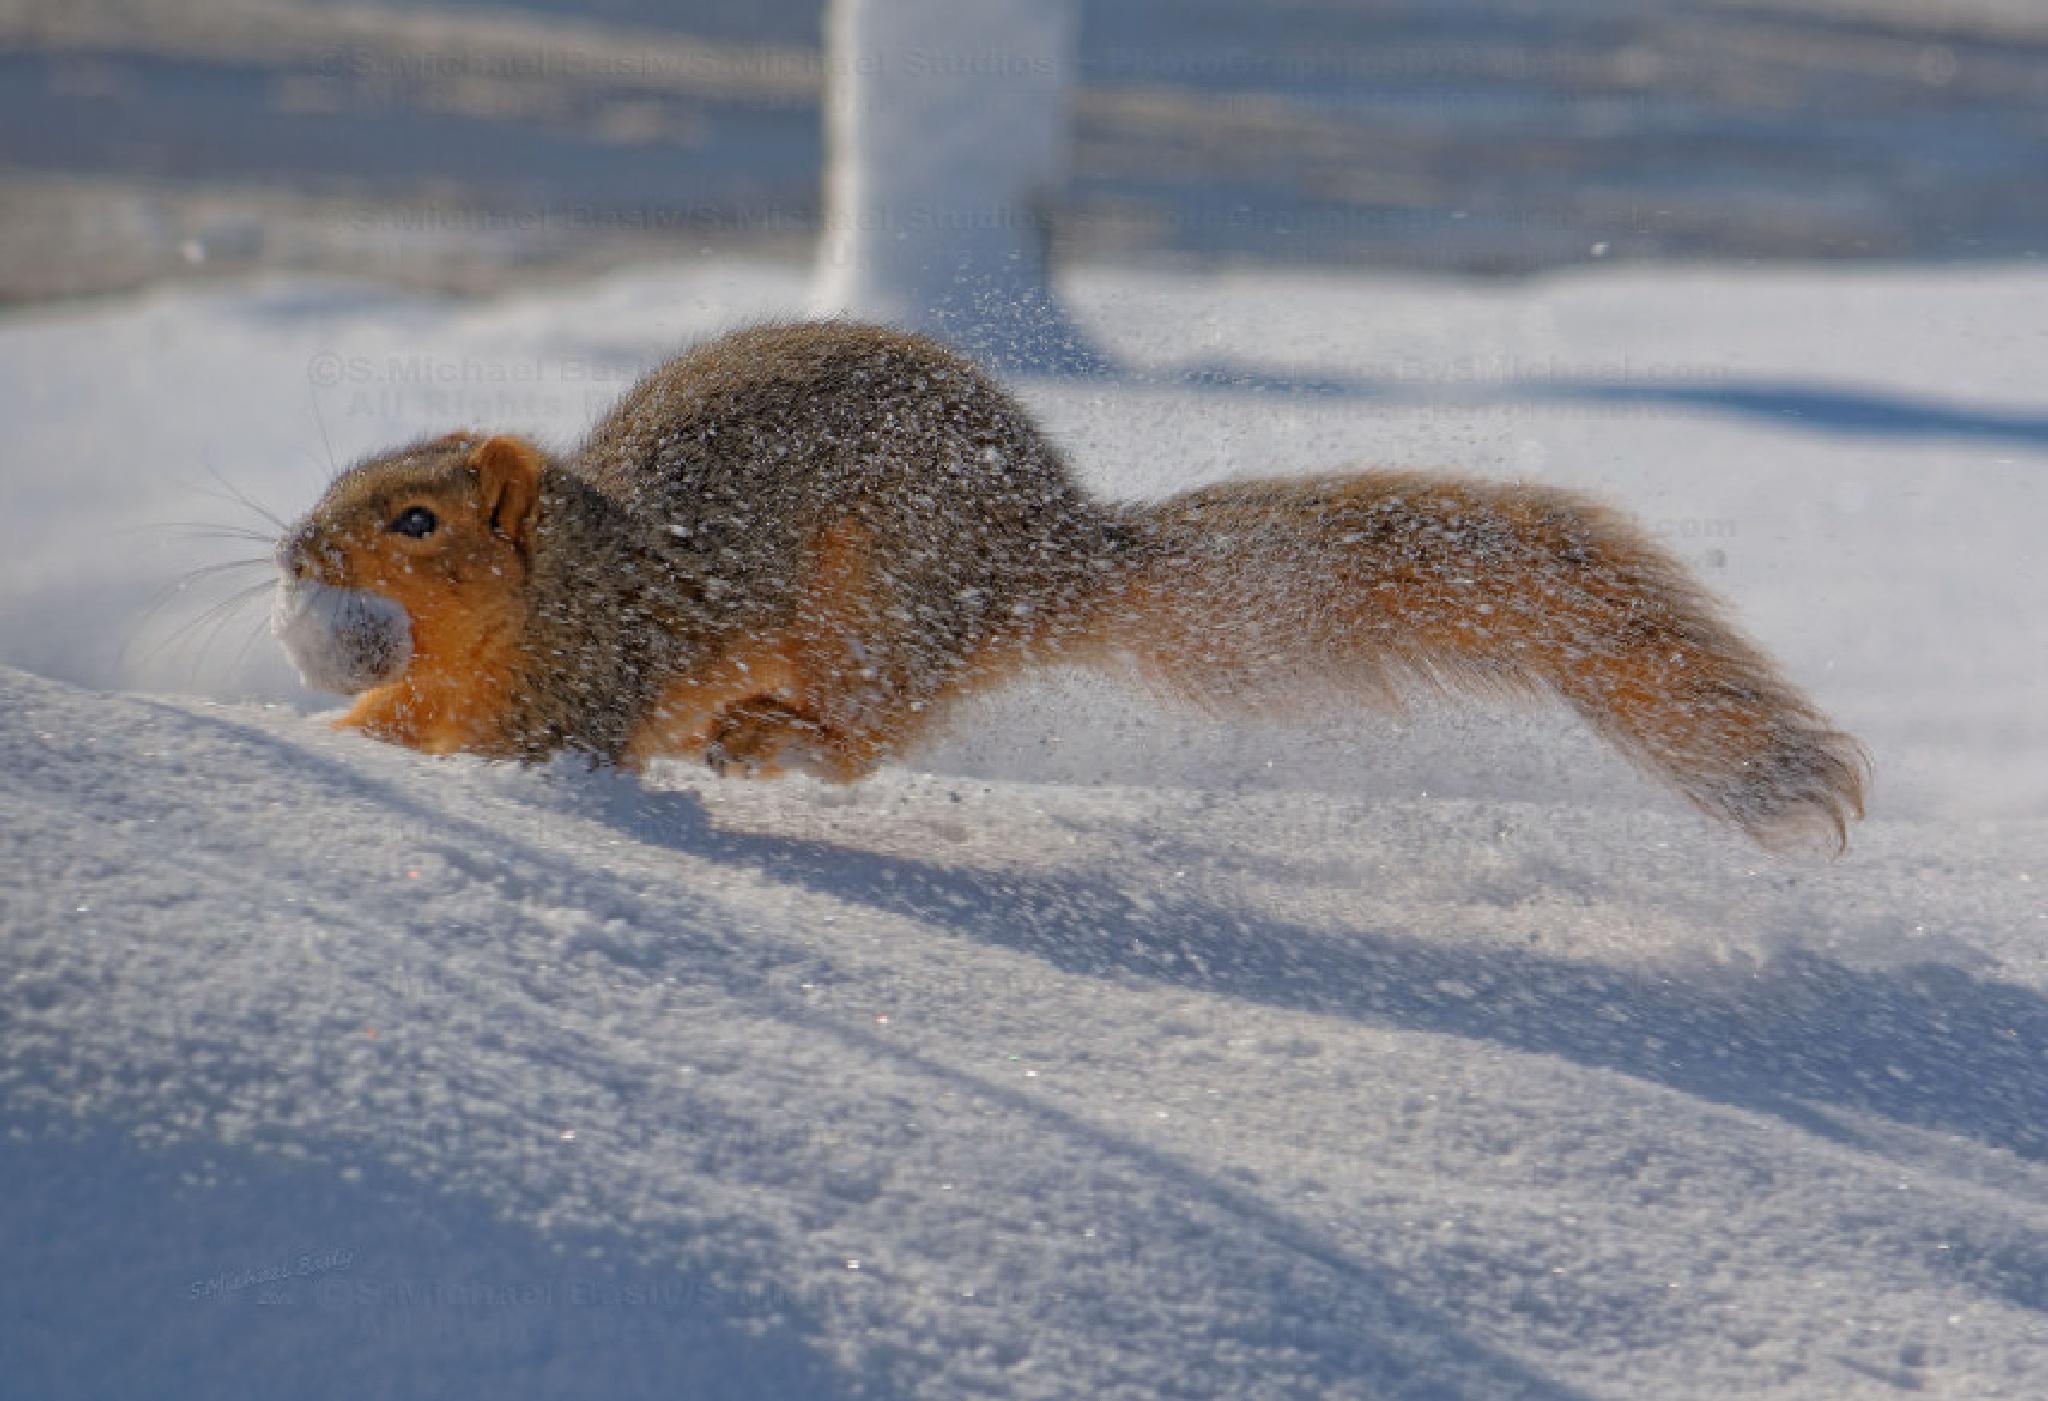 Dashing Through The Snow by sbasly